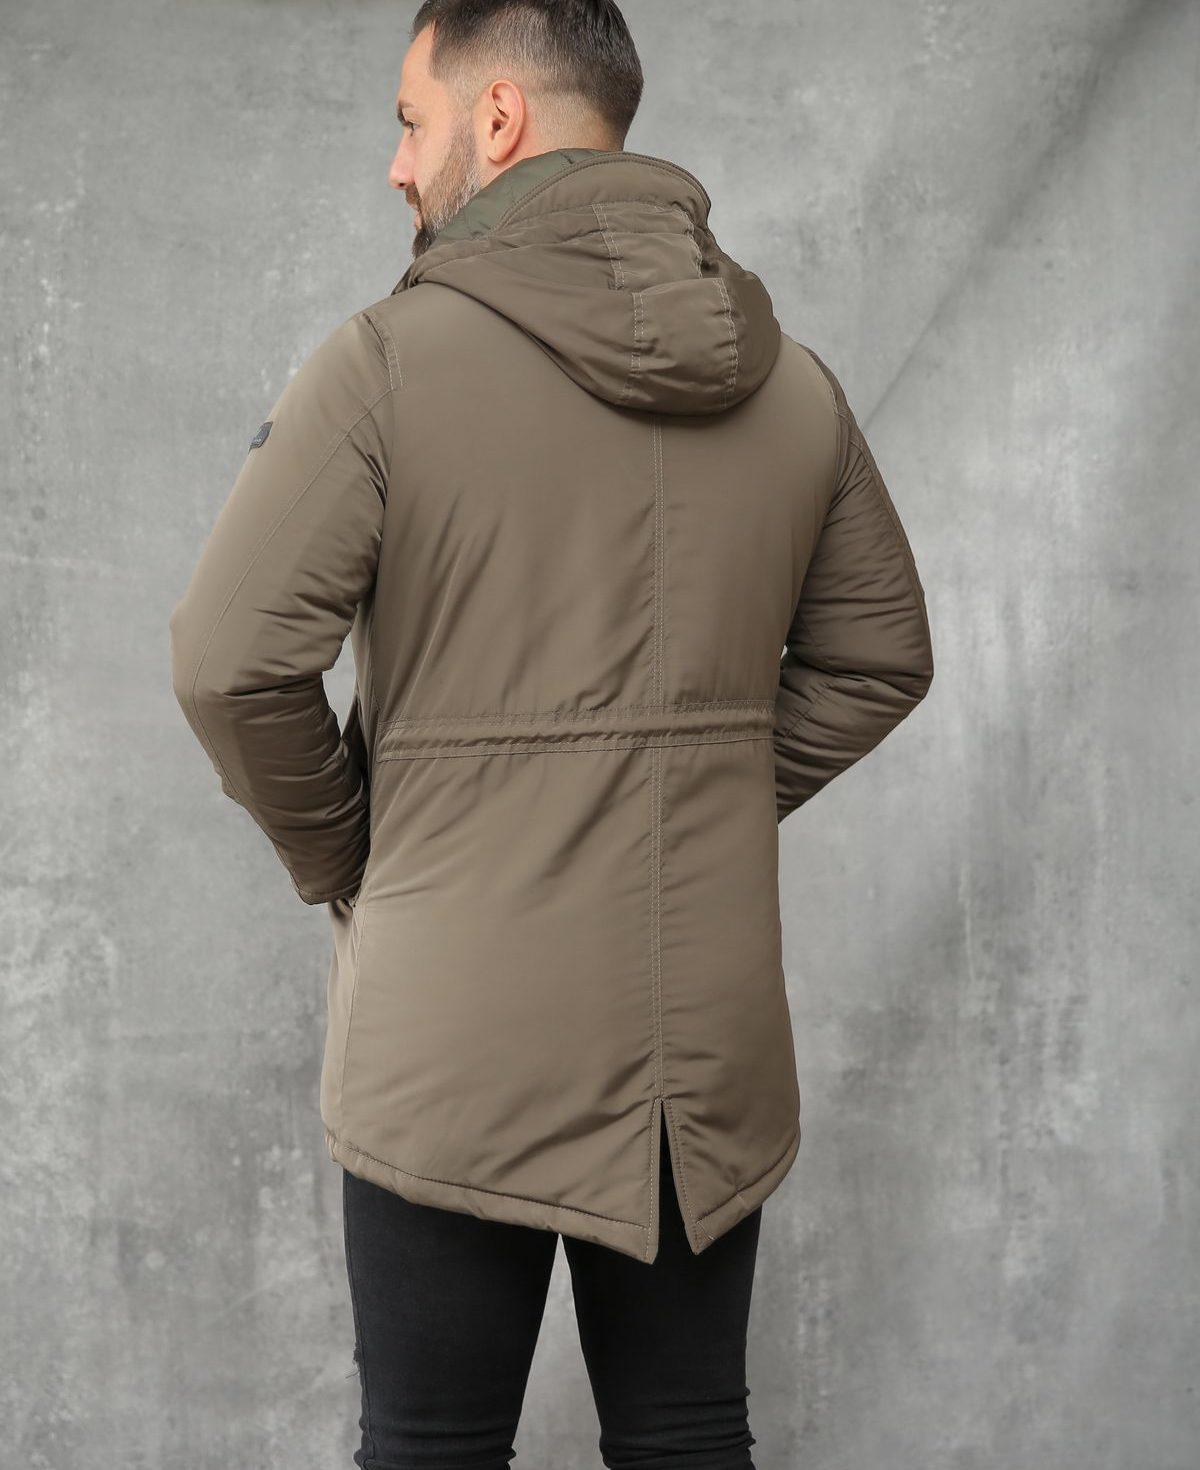 Muška jakna ForteFashion model E9